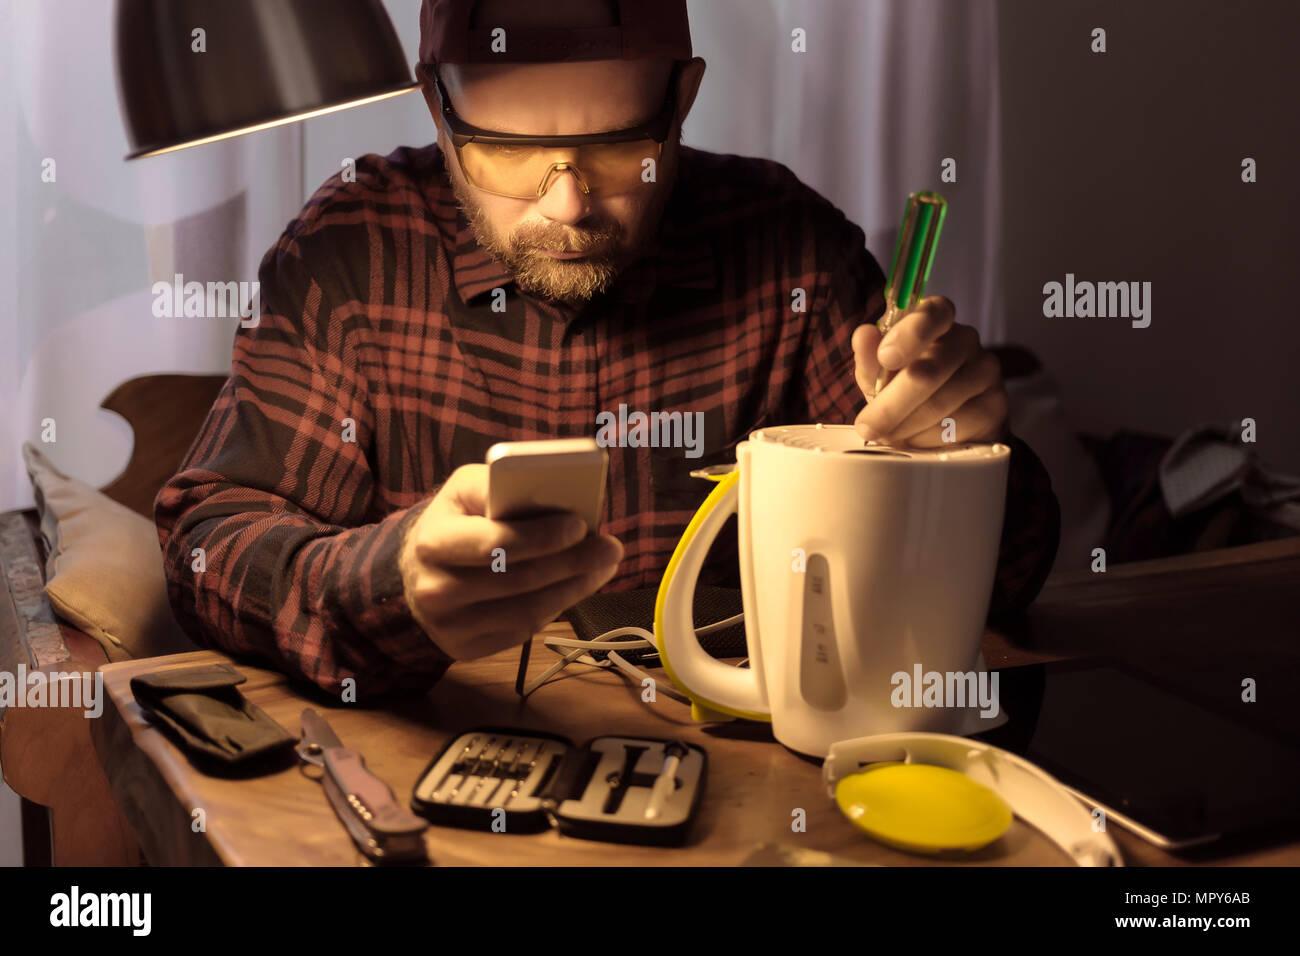 Man wearing protective eyewear while repairing appliance using smart phone at home - Stock Image